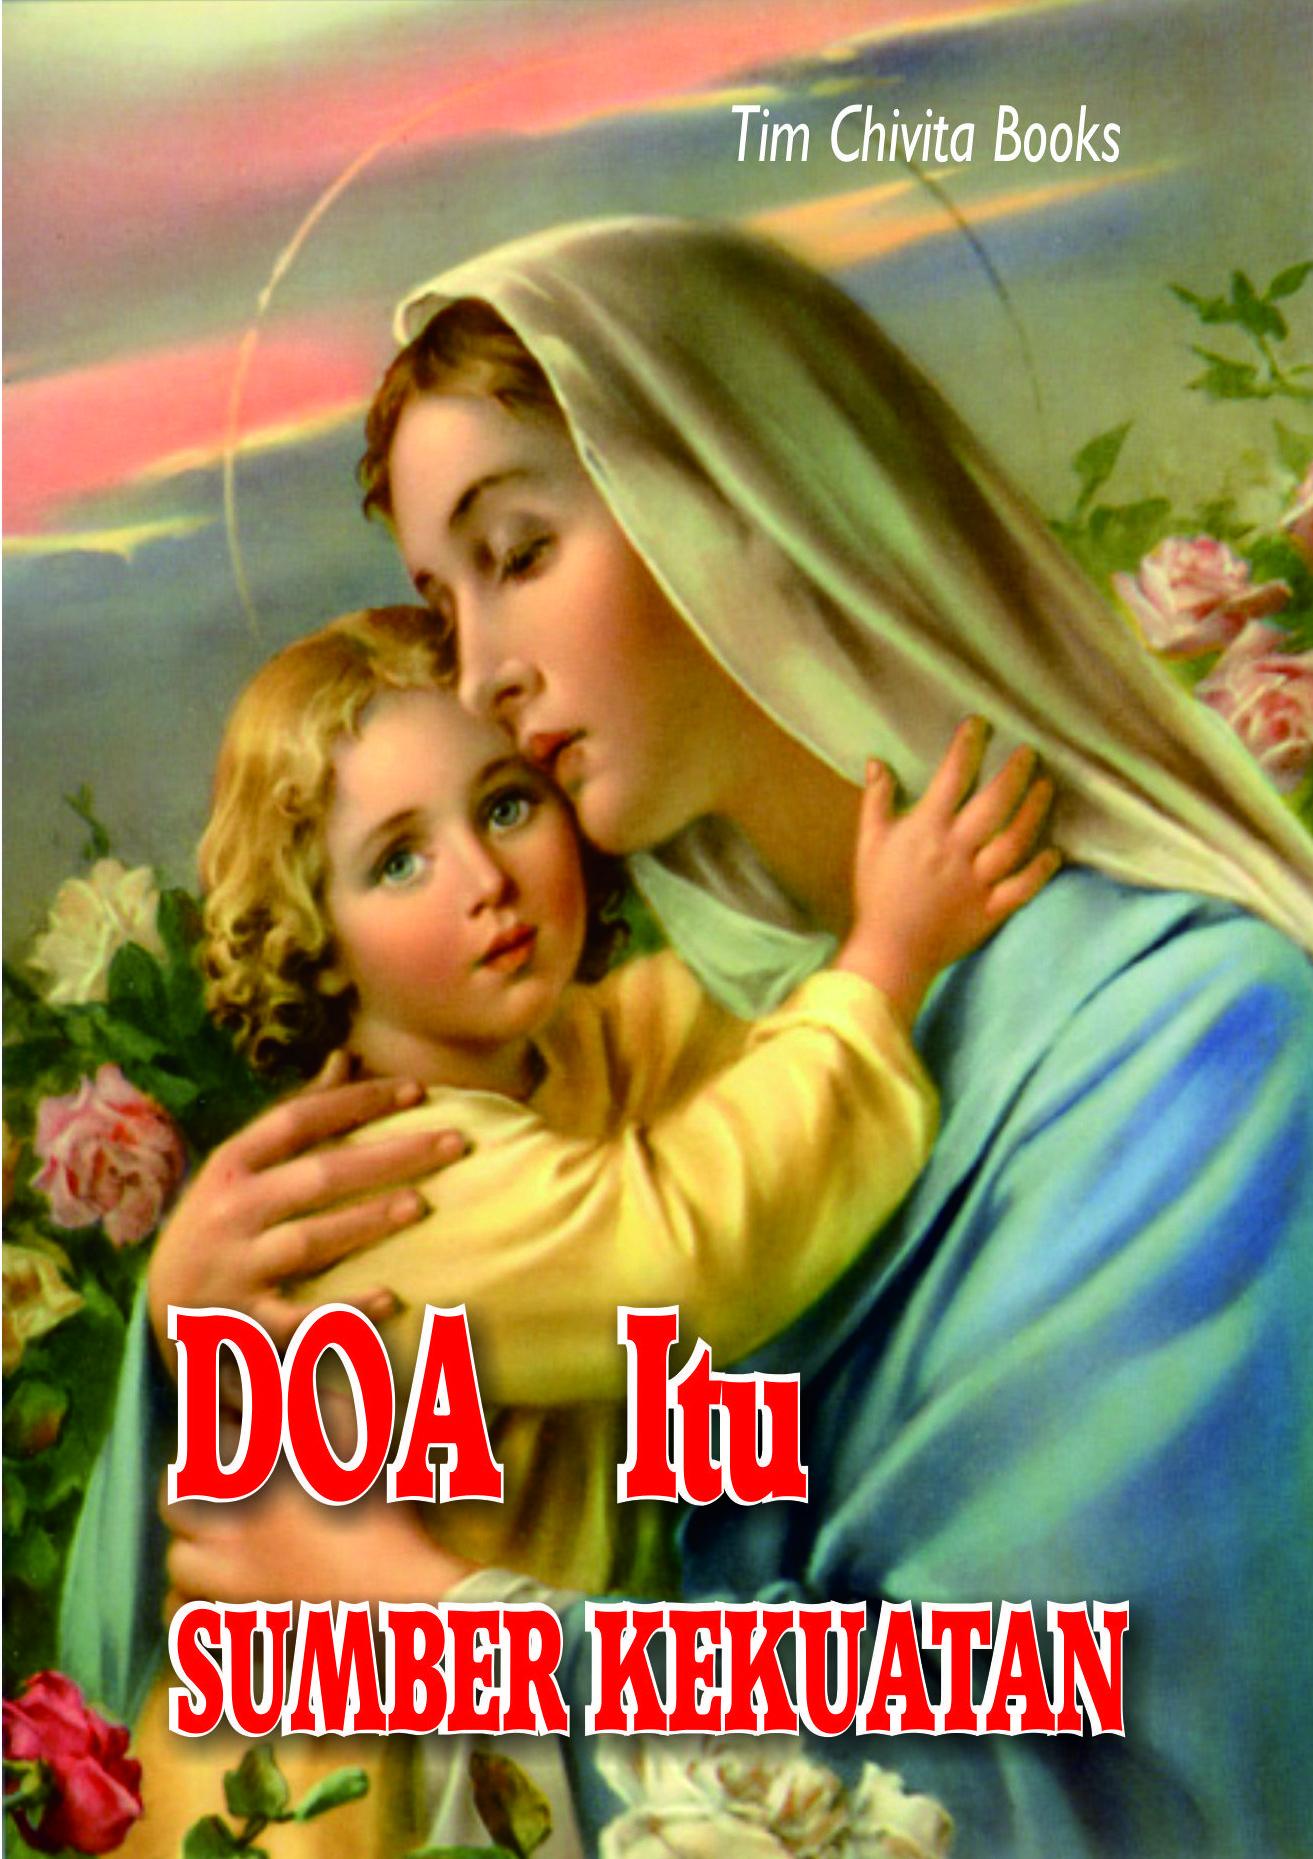 buku doa rohani katolik4 - untuk souvenir-Doa Itu Sumber KEKUATAN